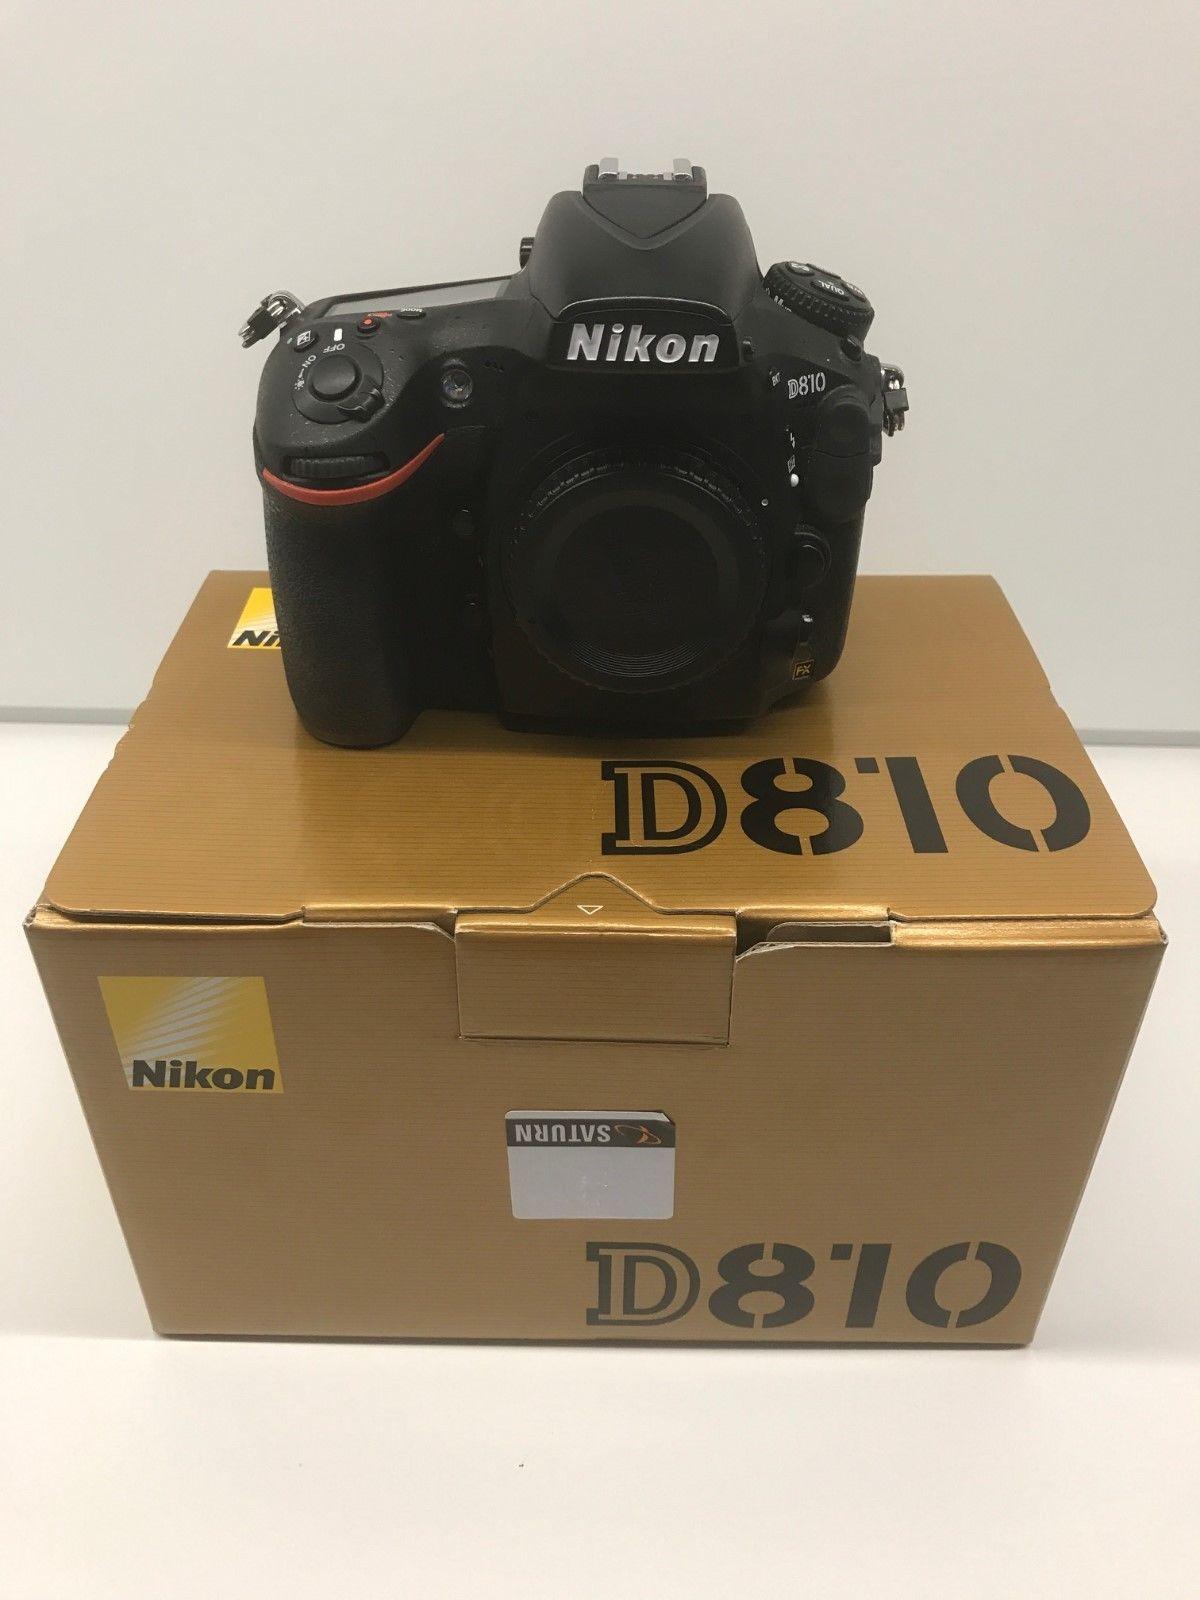 Nikon D810 36.3MP Digitalkamera-Schwarz-OVP & top Zustand (Köln) nur 7600 Fotos!